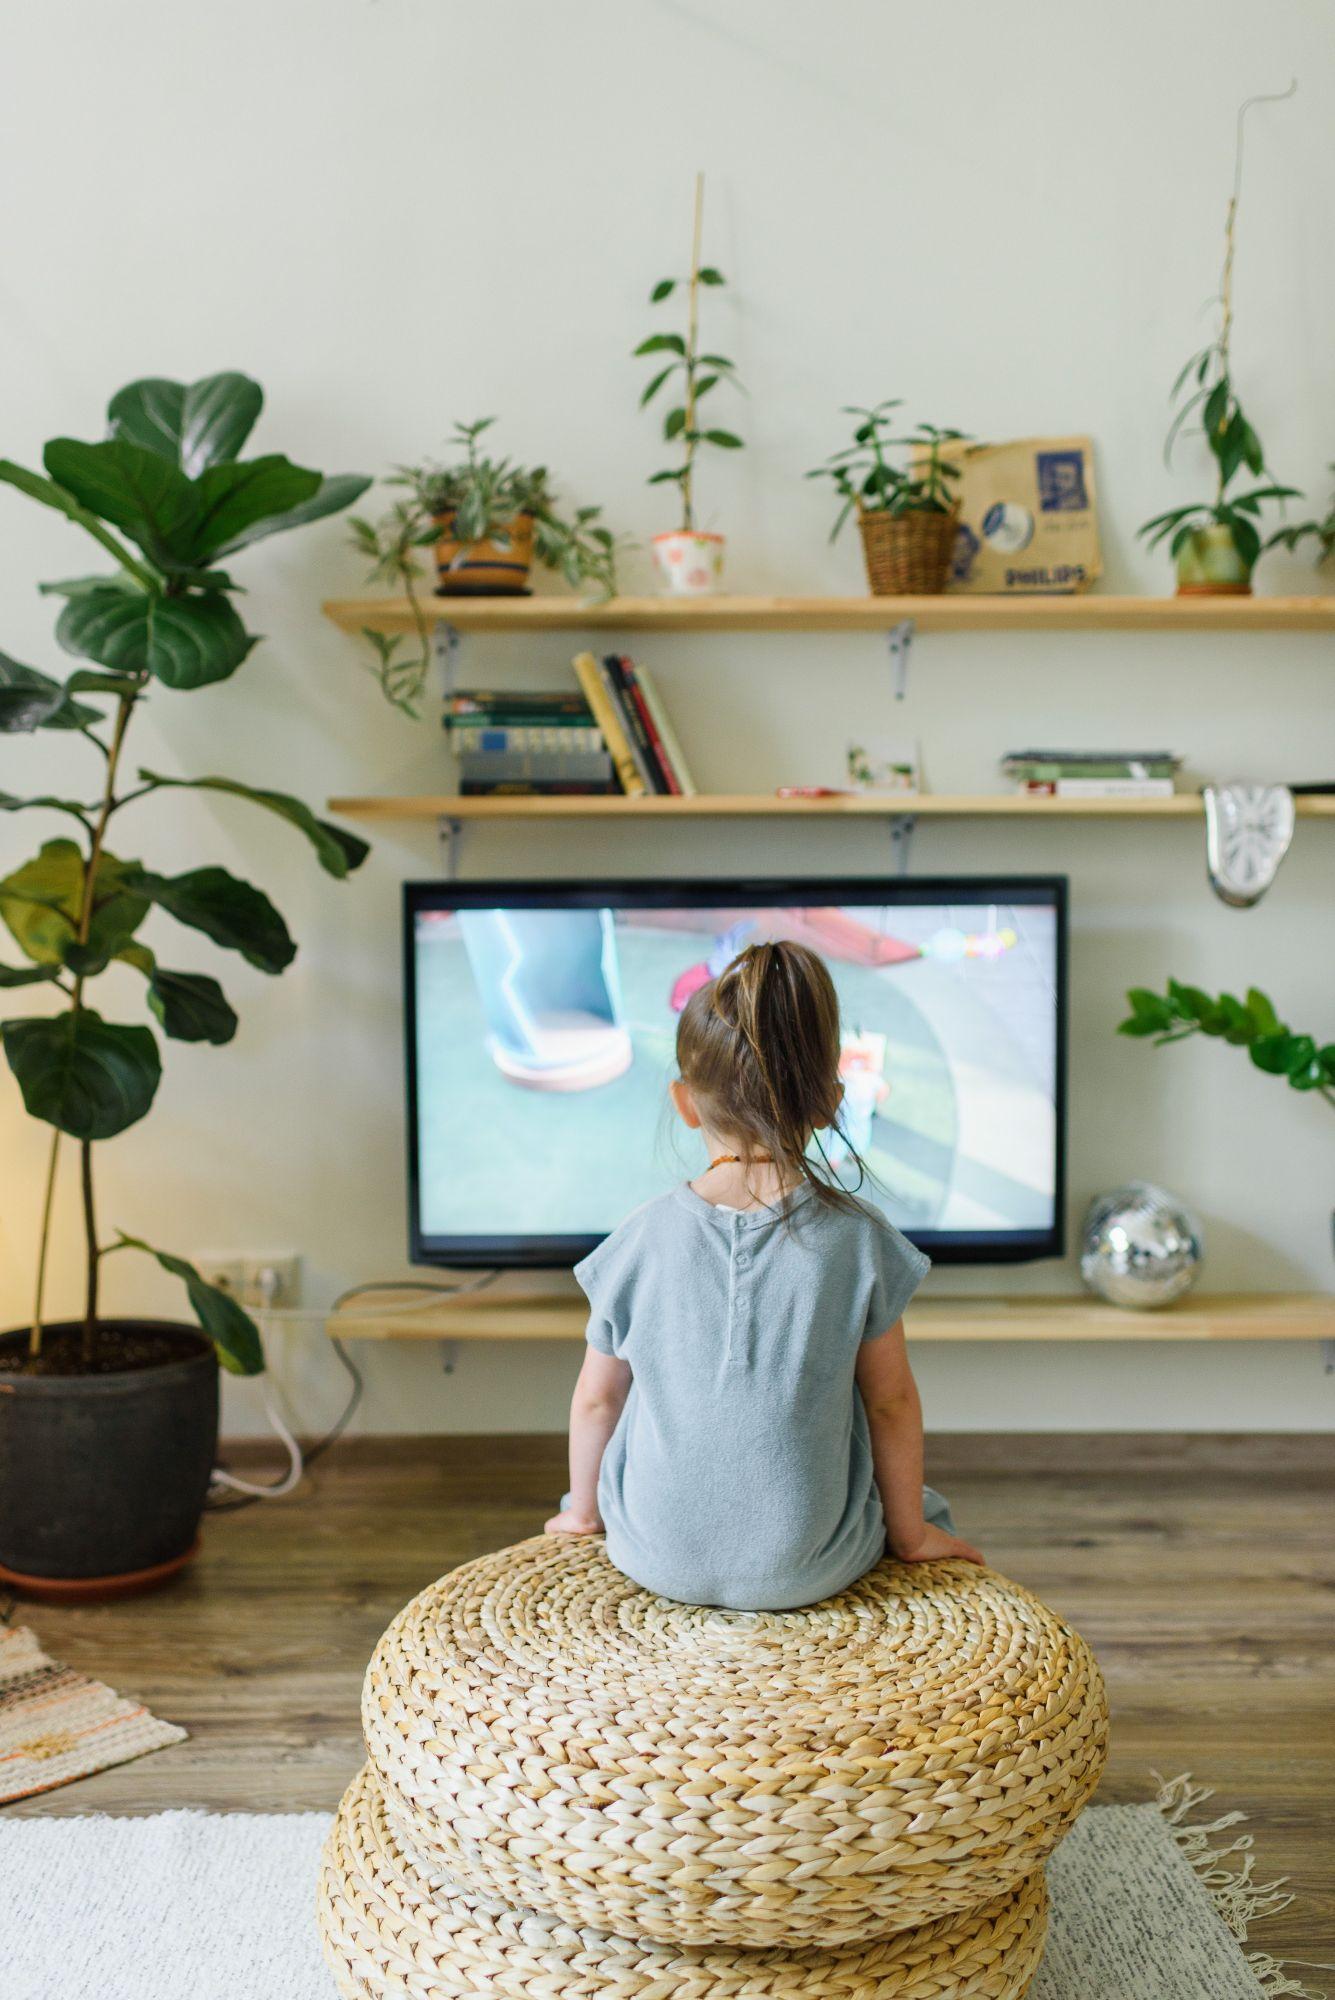 8 Kids' Series on Netflix That Your Children Should Watch